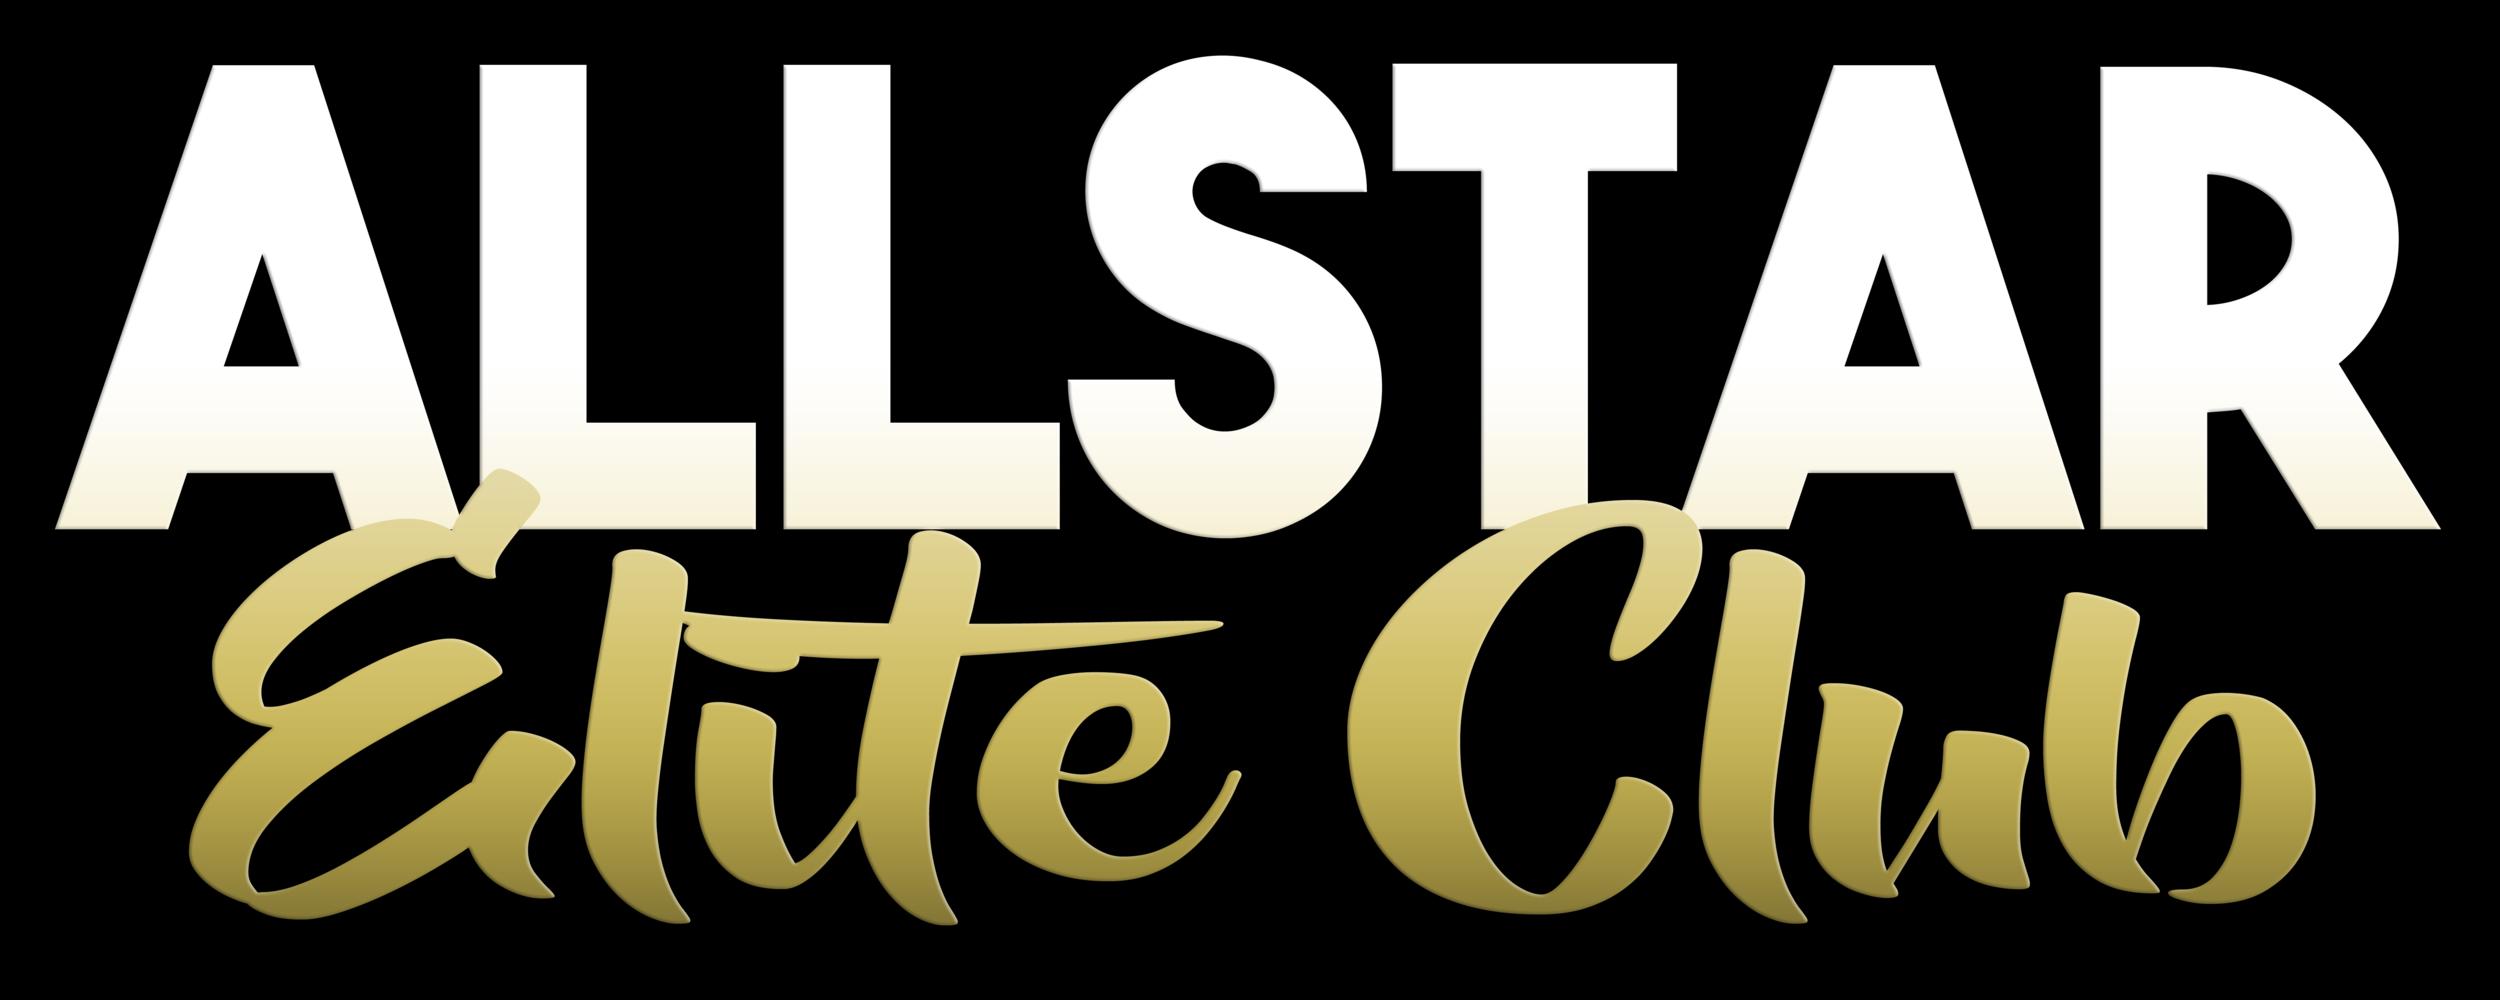 Rock - Allstar Elite Club (Banner 1).png